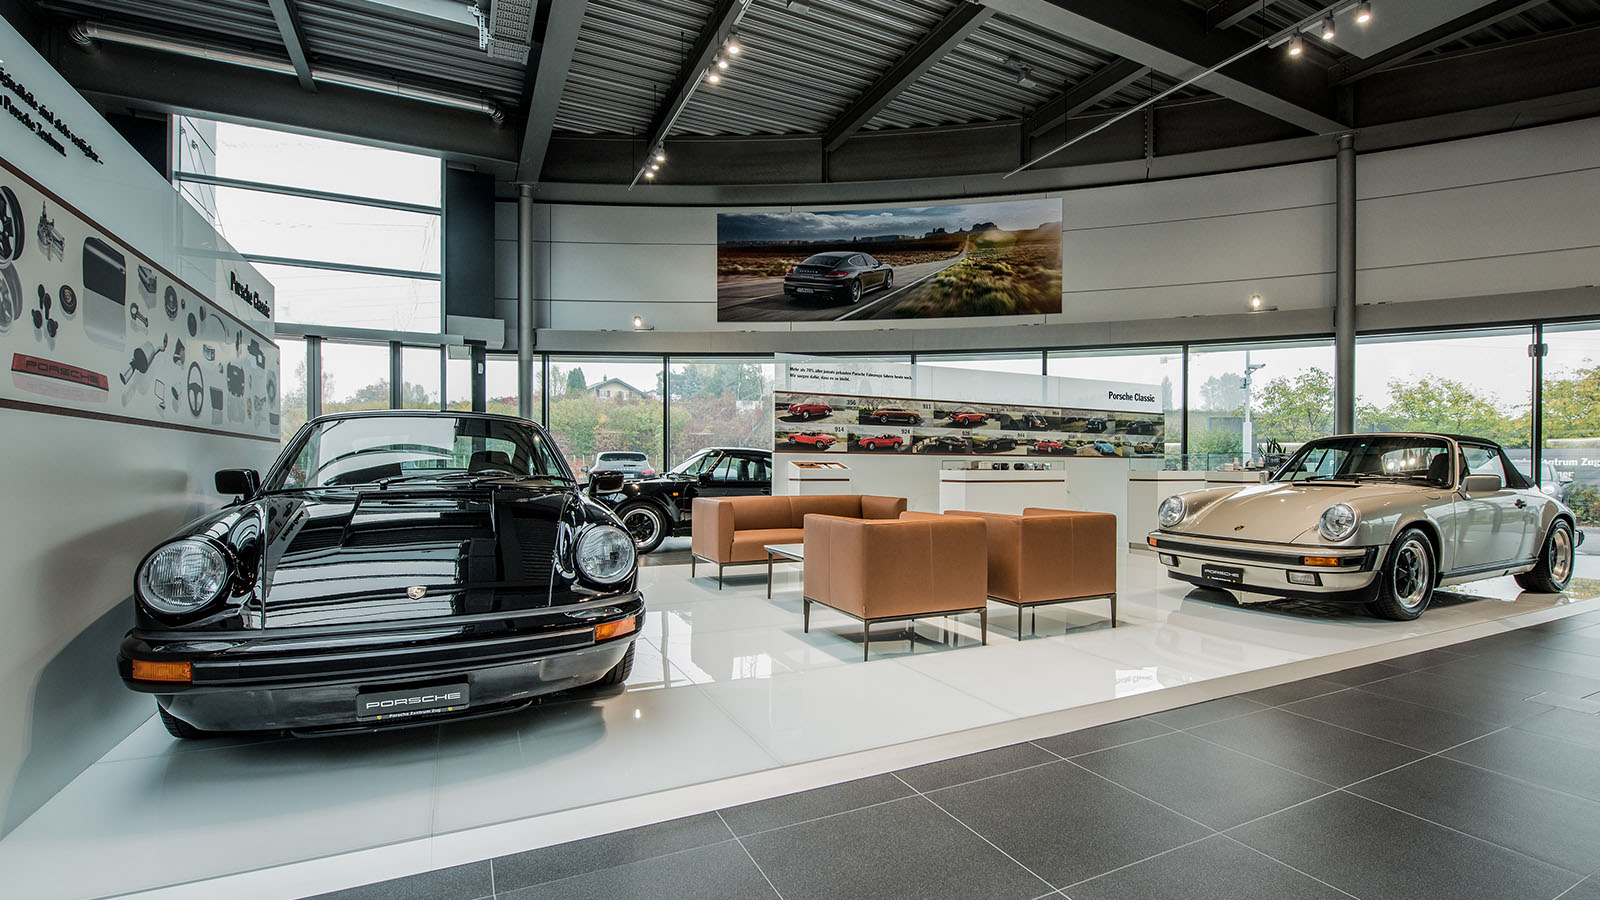 Porsche - Порше Центр Цуг